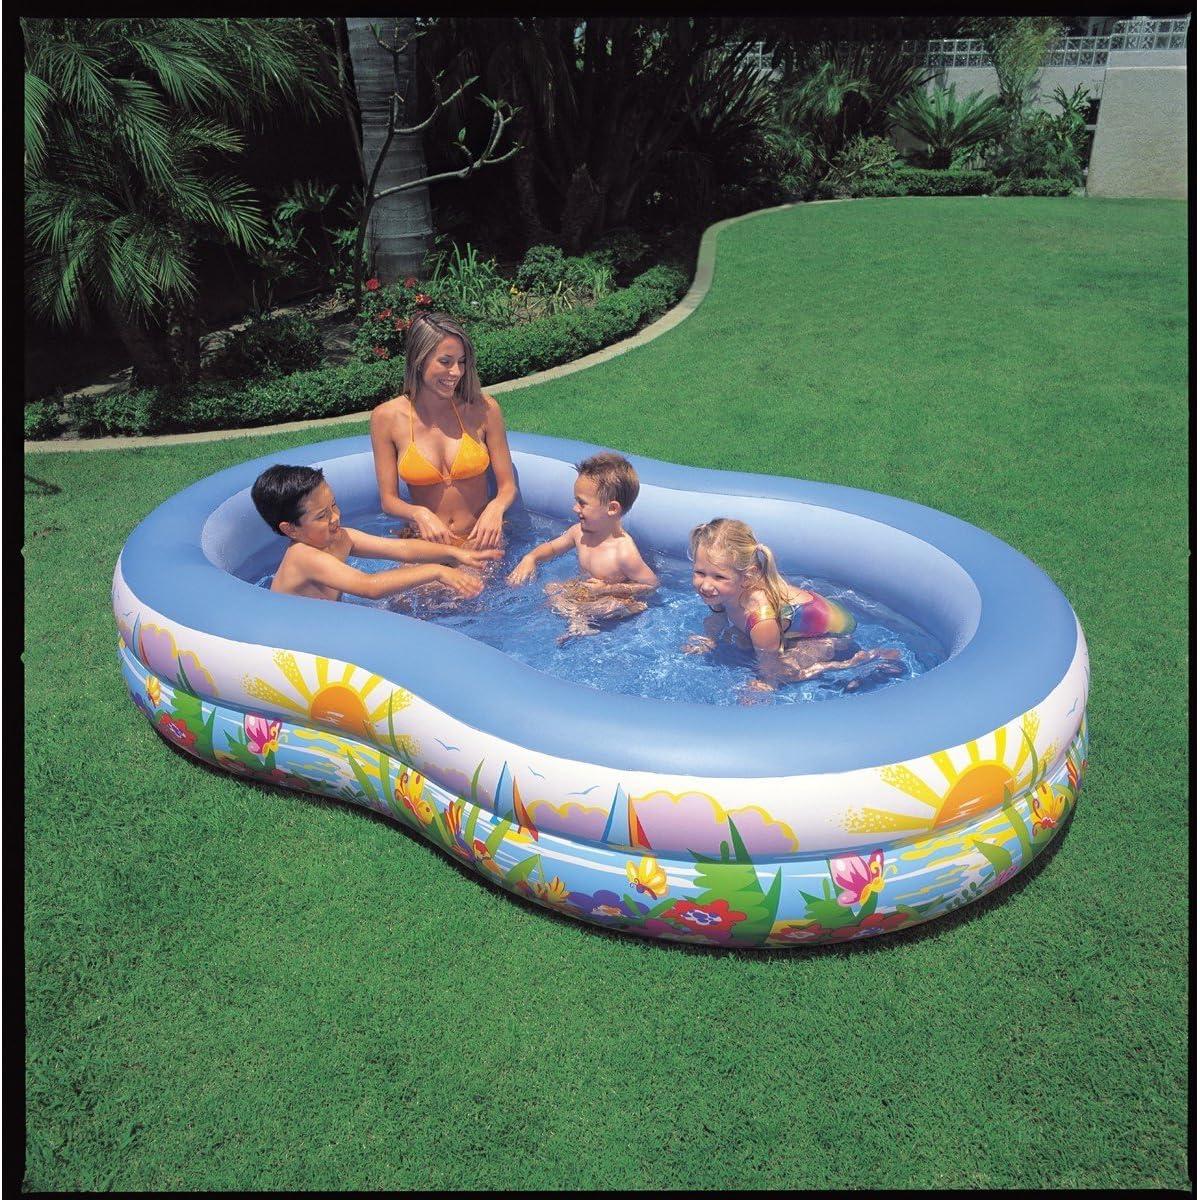 Intex recreation swim center paradise lagoon pool price in Intex swimming pools prices in pakistan